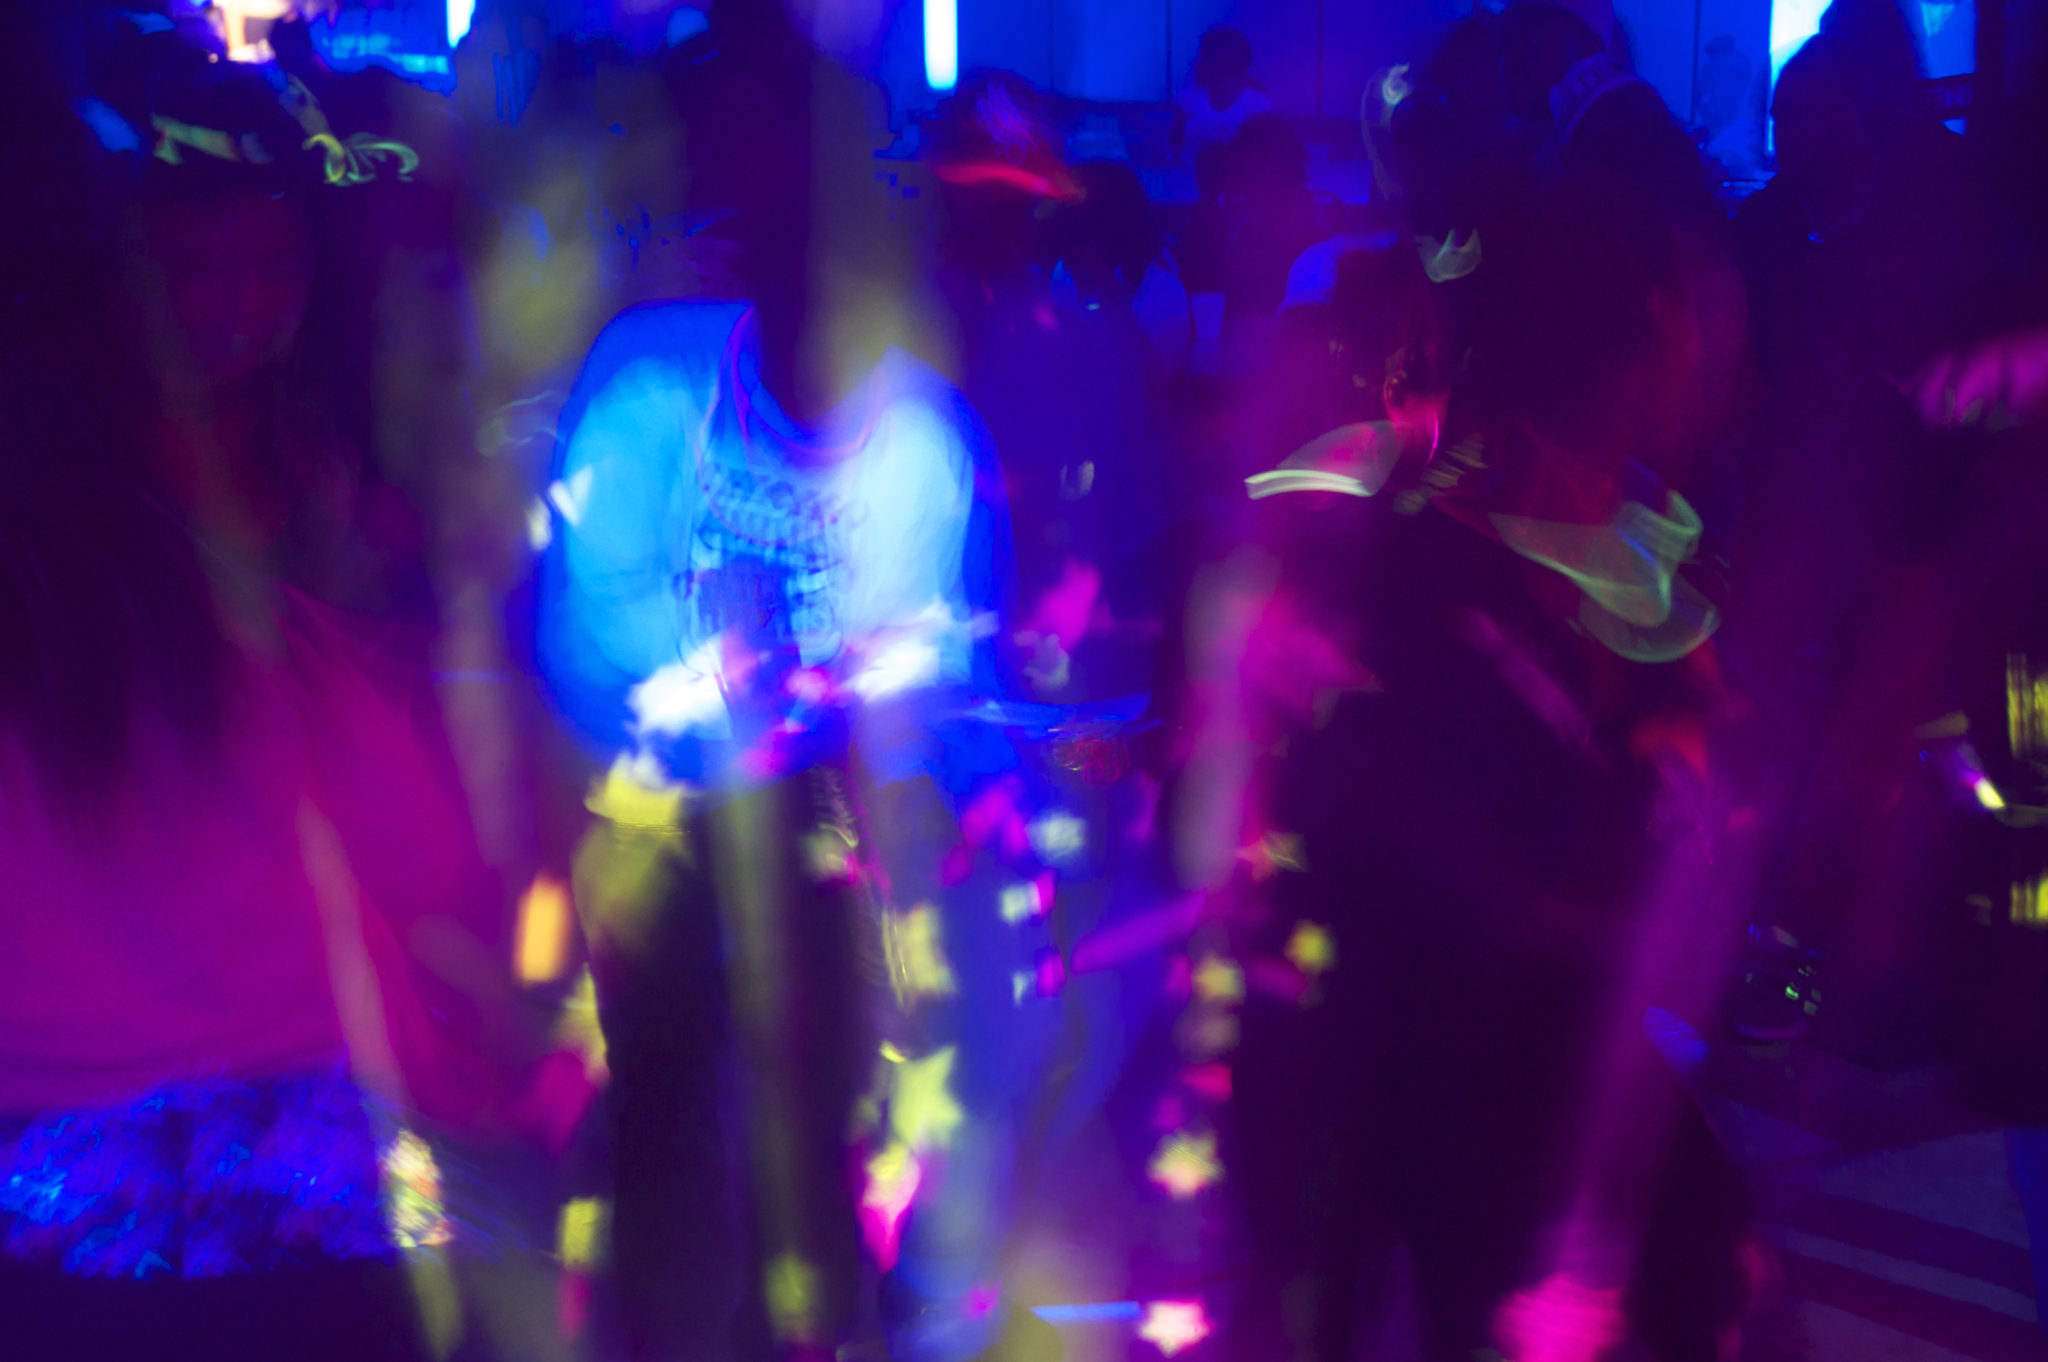 light dj blacklight events glow party extreme lighting black